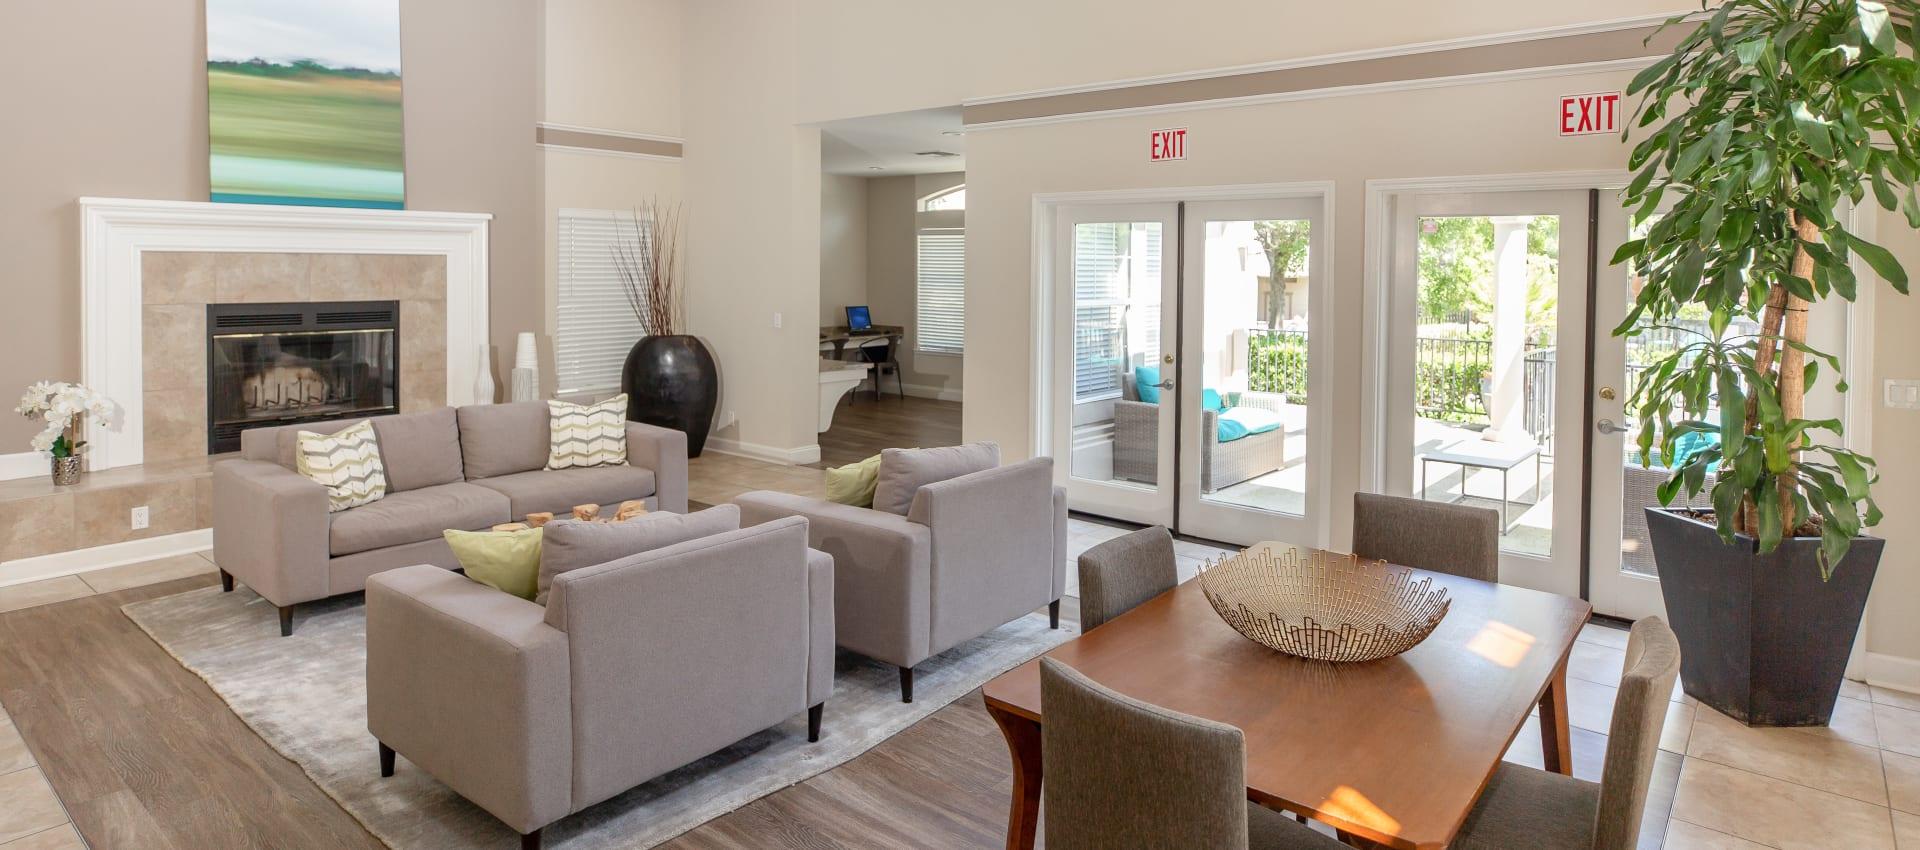 Resident lounge at Shaliko in Rocklin, California.